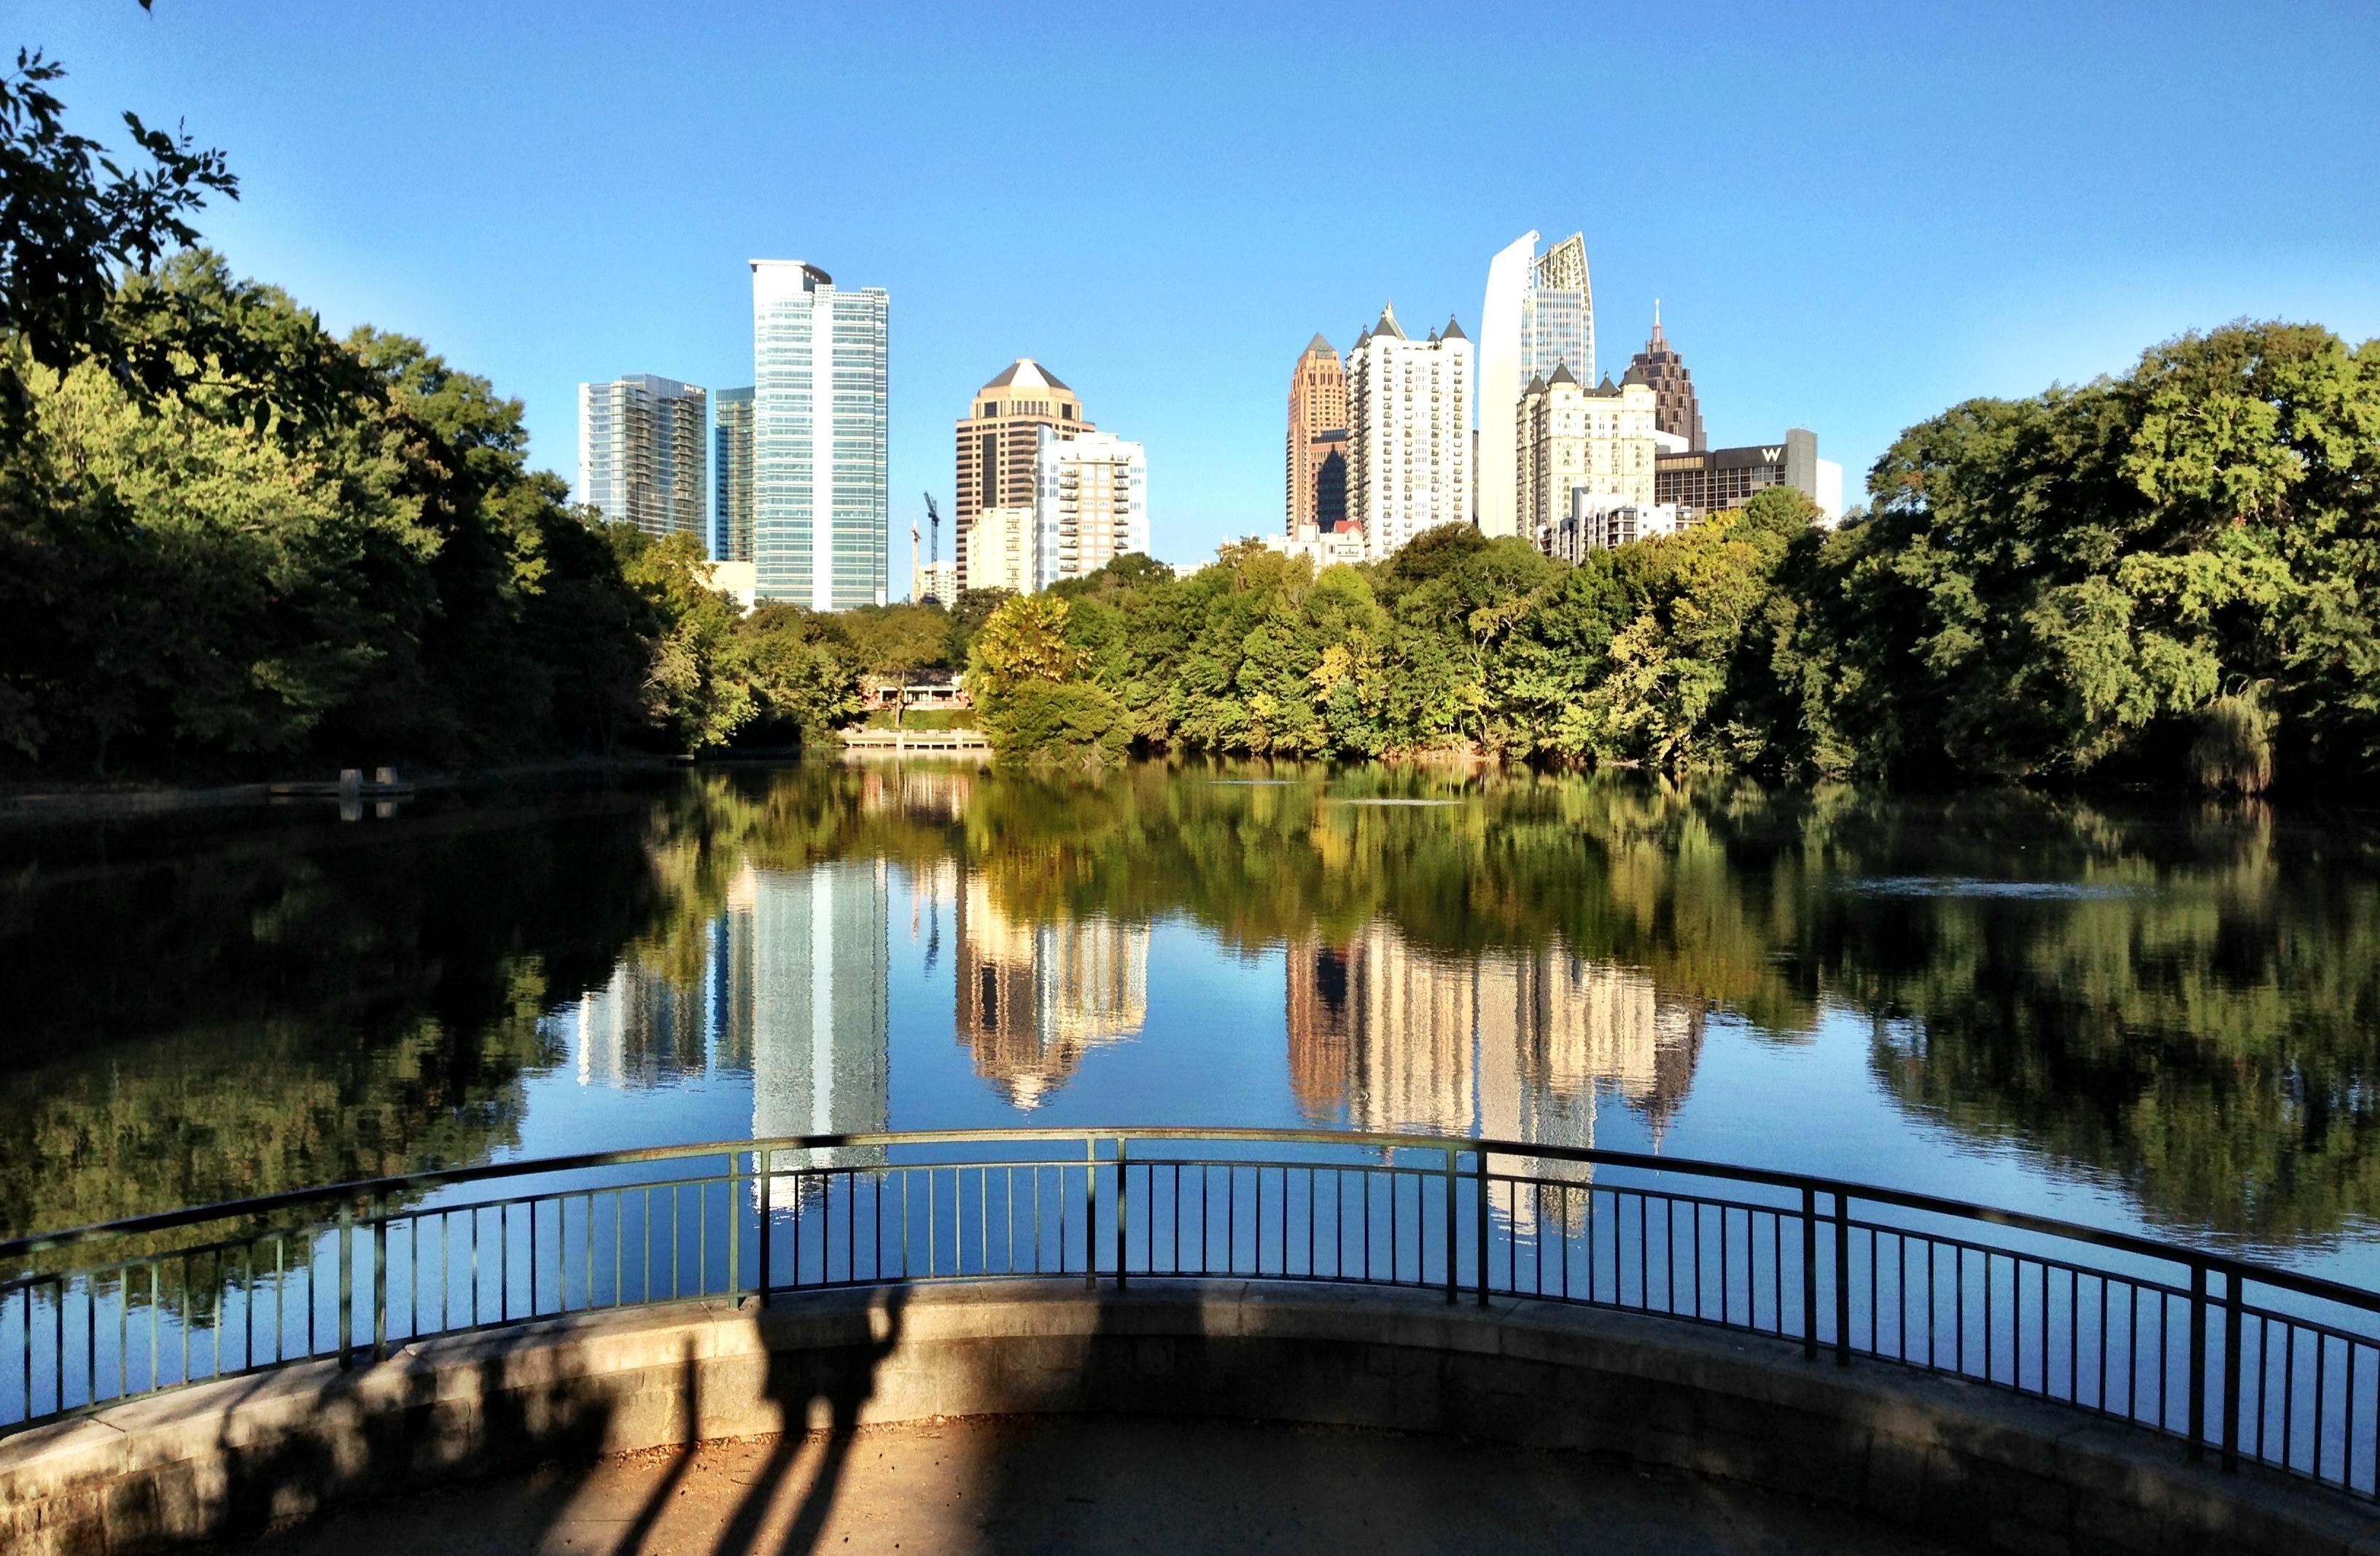 Piedmont Park has an amazing view of the Atlanta skyline